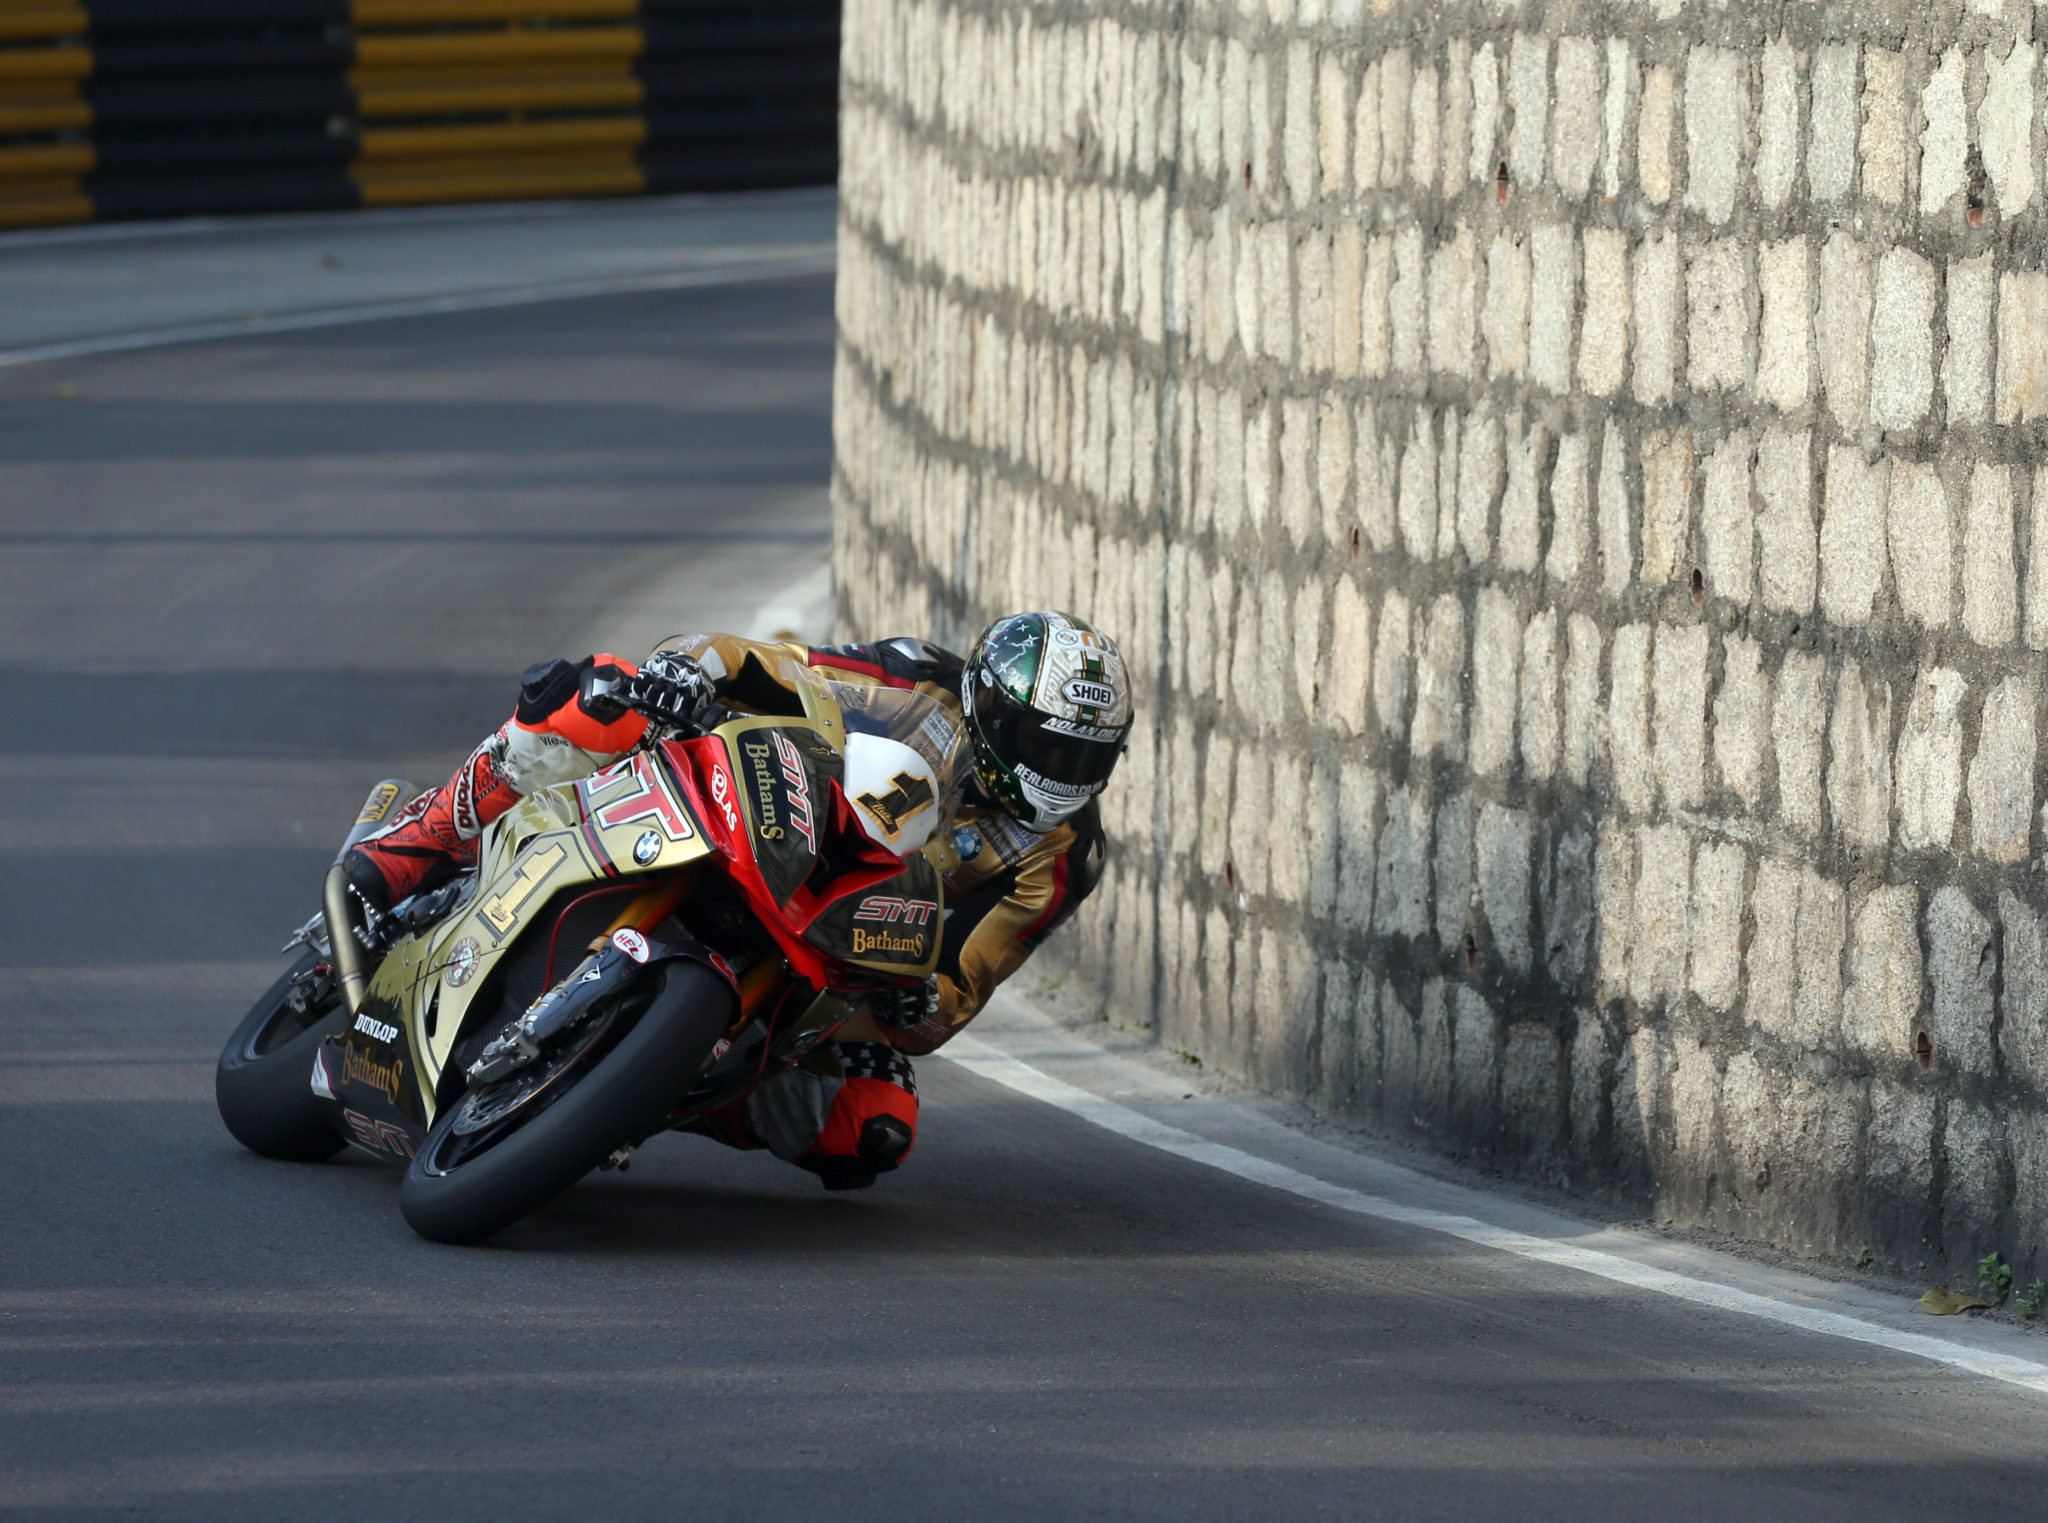 Peter Hickman racing in Macau credit Pacemaker Press International